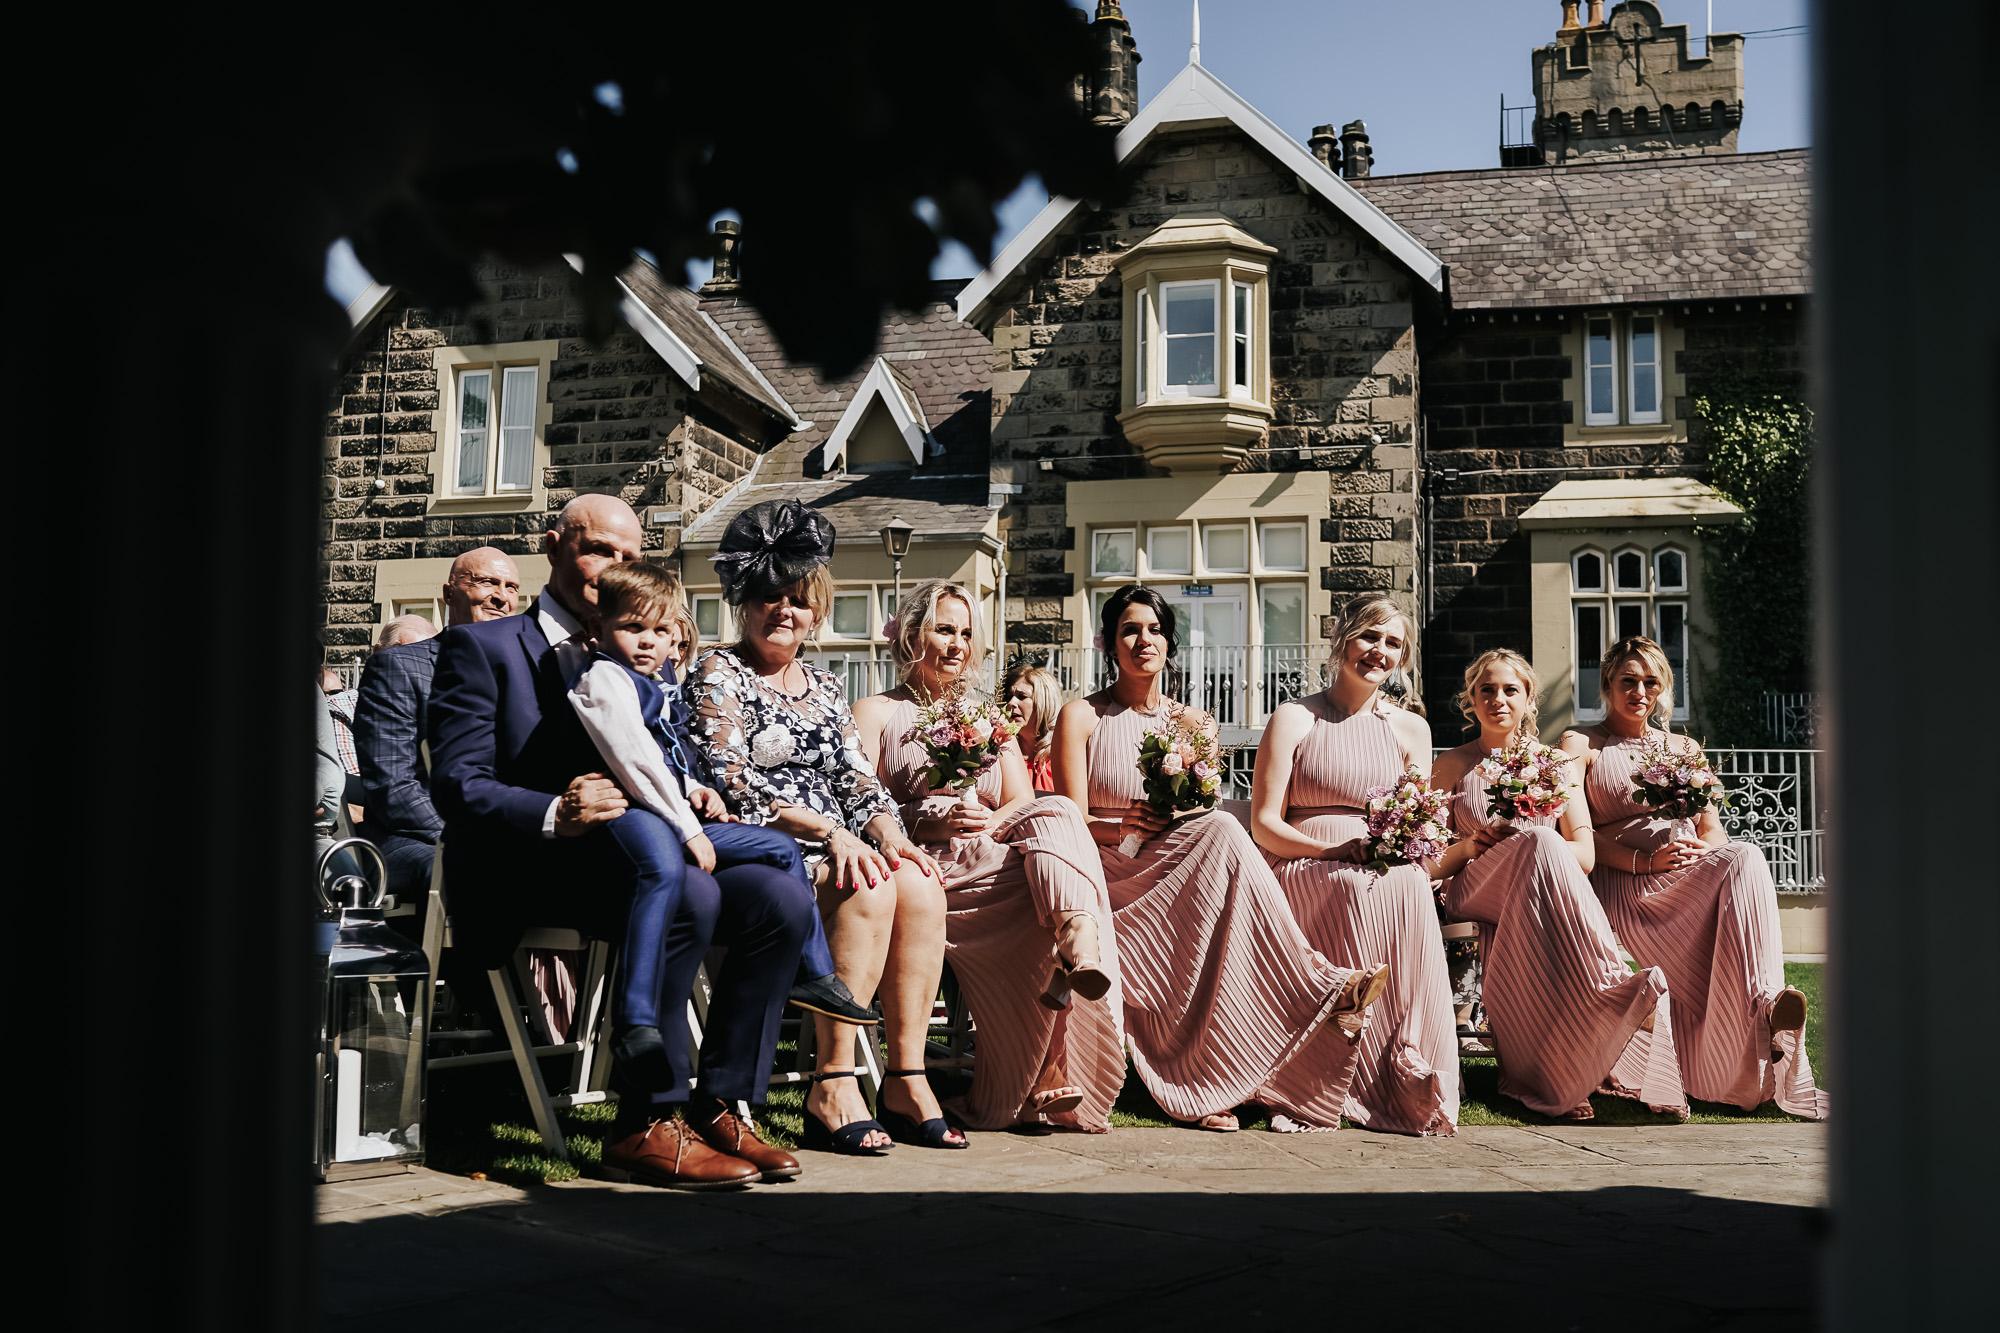 West Tower Wedding Venue Orkskirk Lancashire Wedding Photography cheshire wedding photographer (15 of 47).jpg